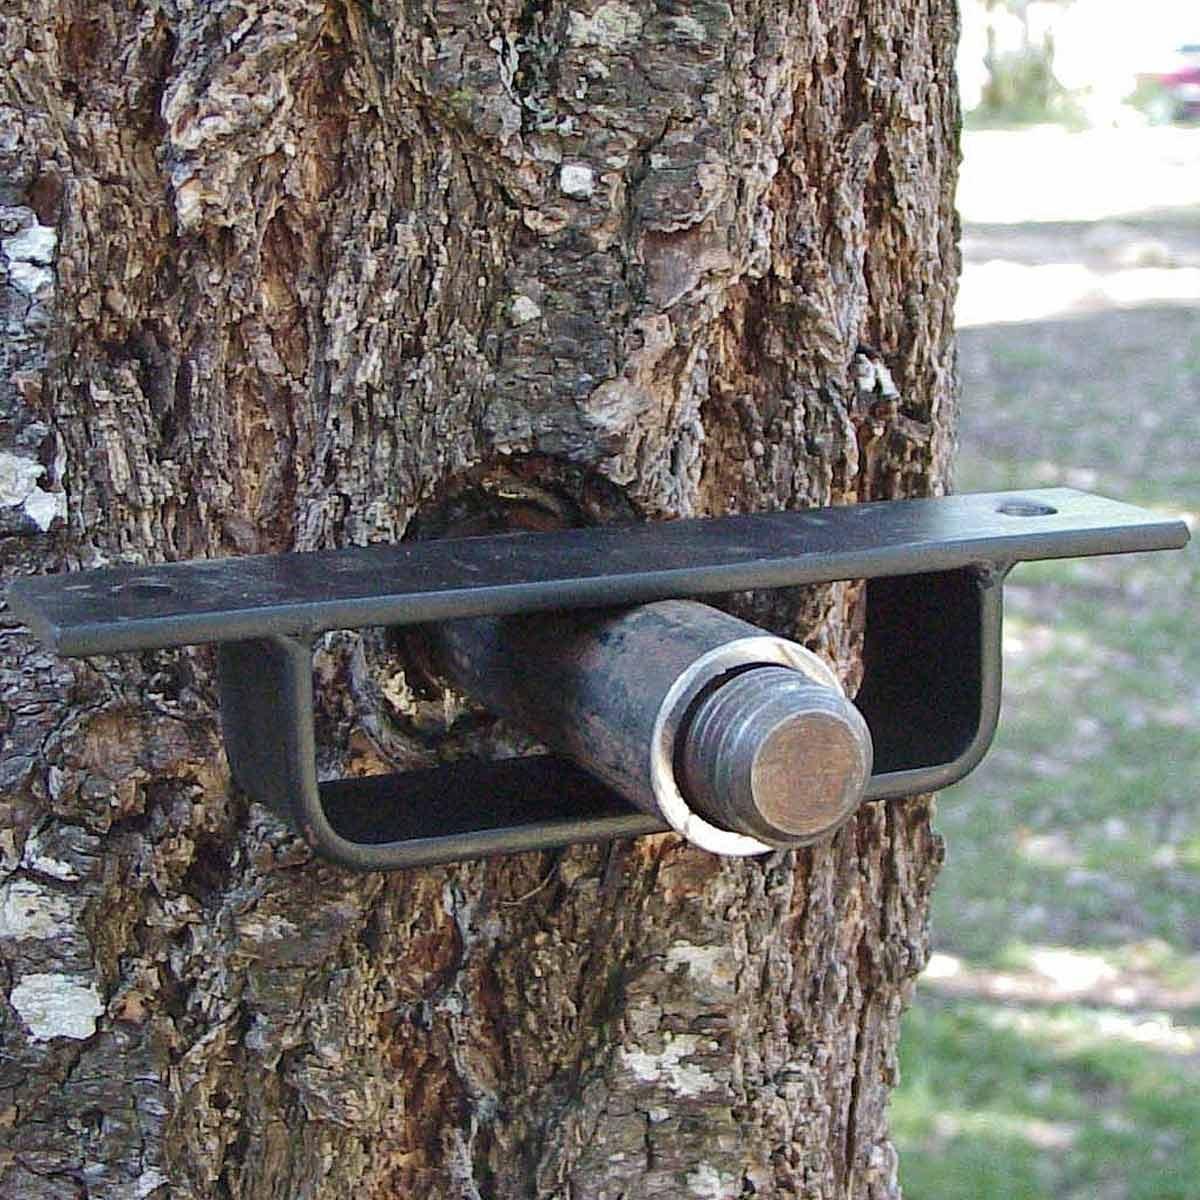 How to Build a Tree House | Family Handyman